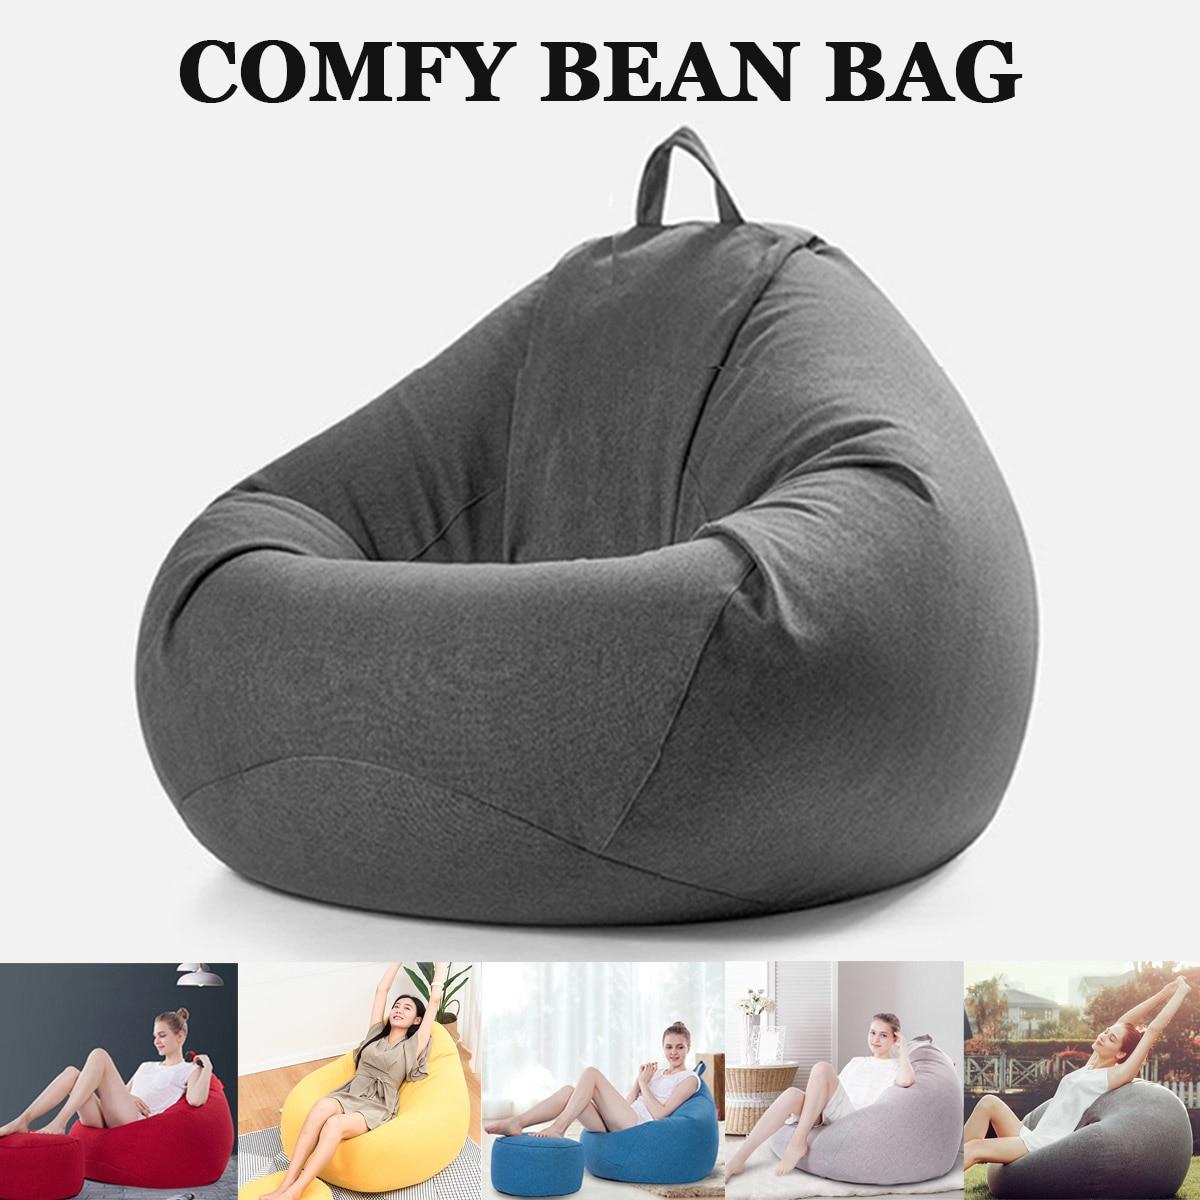 Sensational Simply The Best Lazy Beanbag Chairs Inzonedesignstudio Interior Chair Design Inzonedesignstudiocom